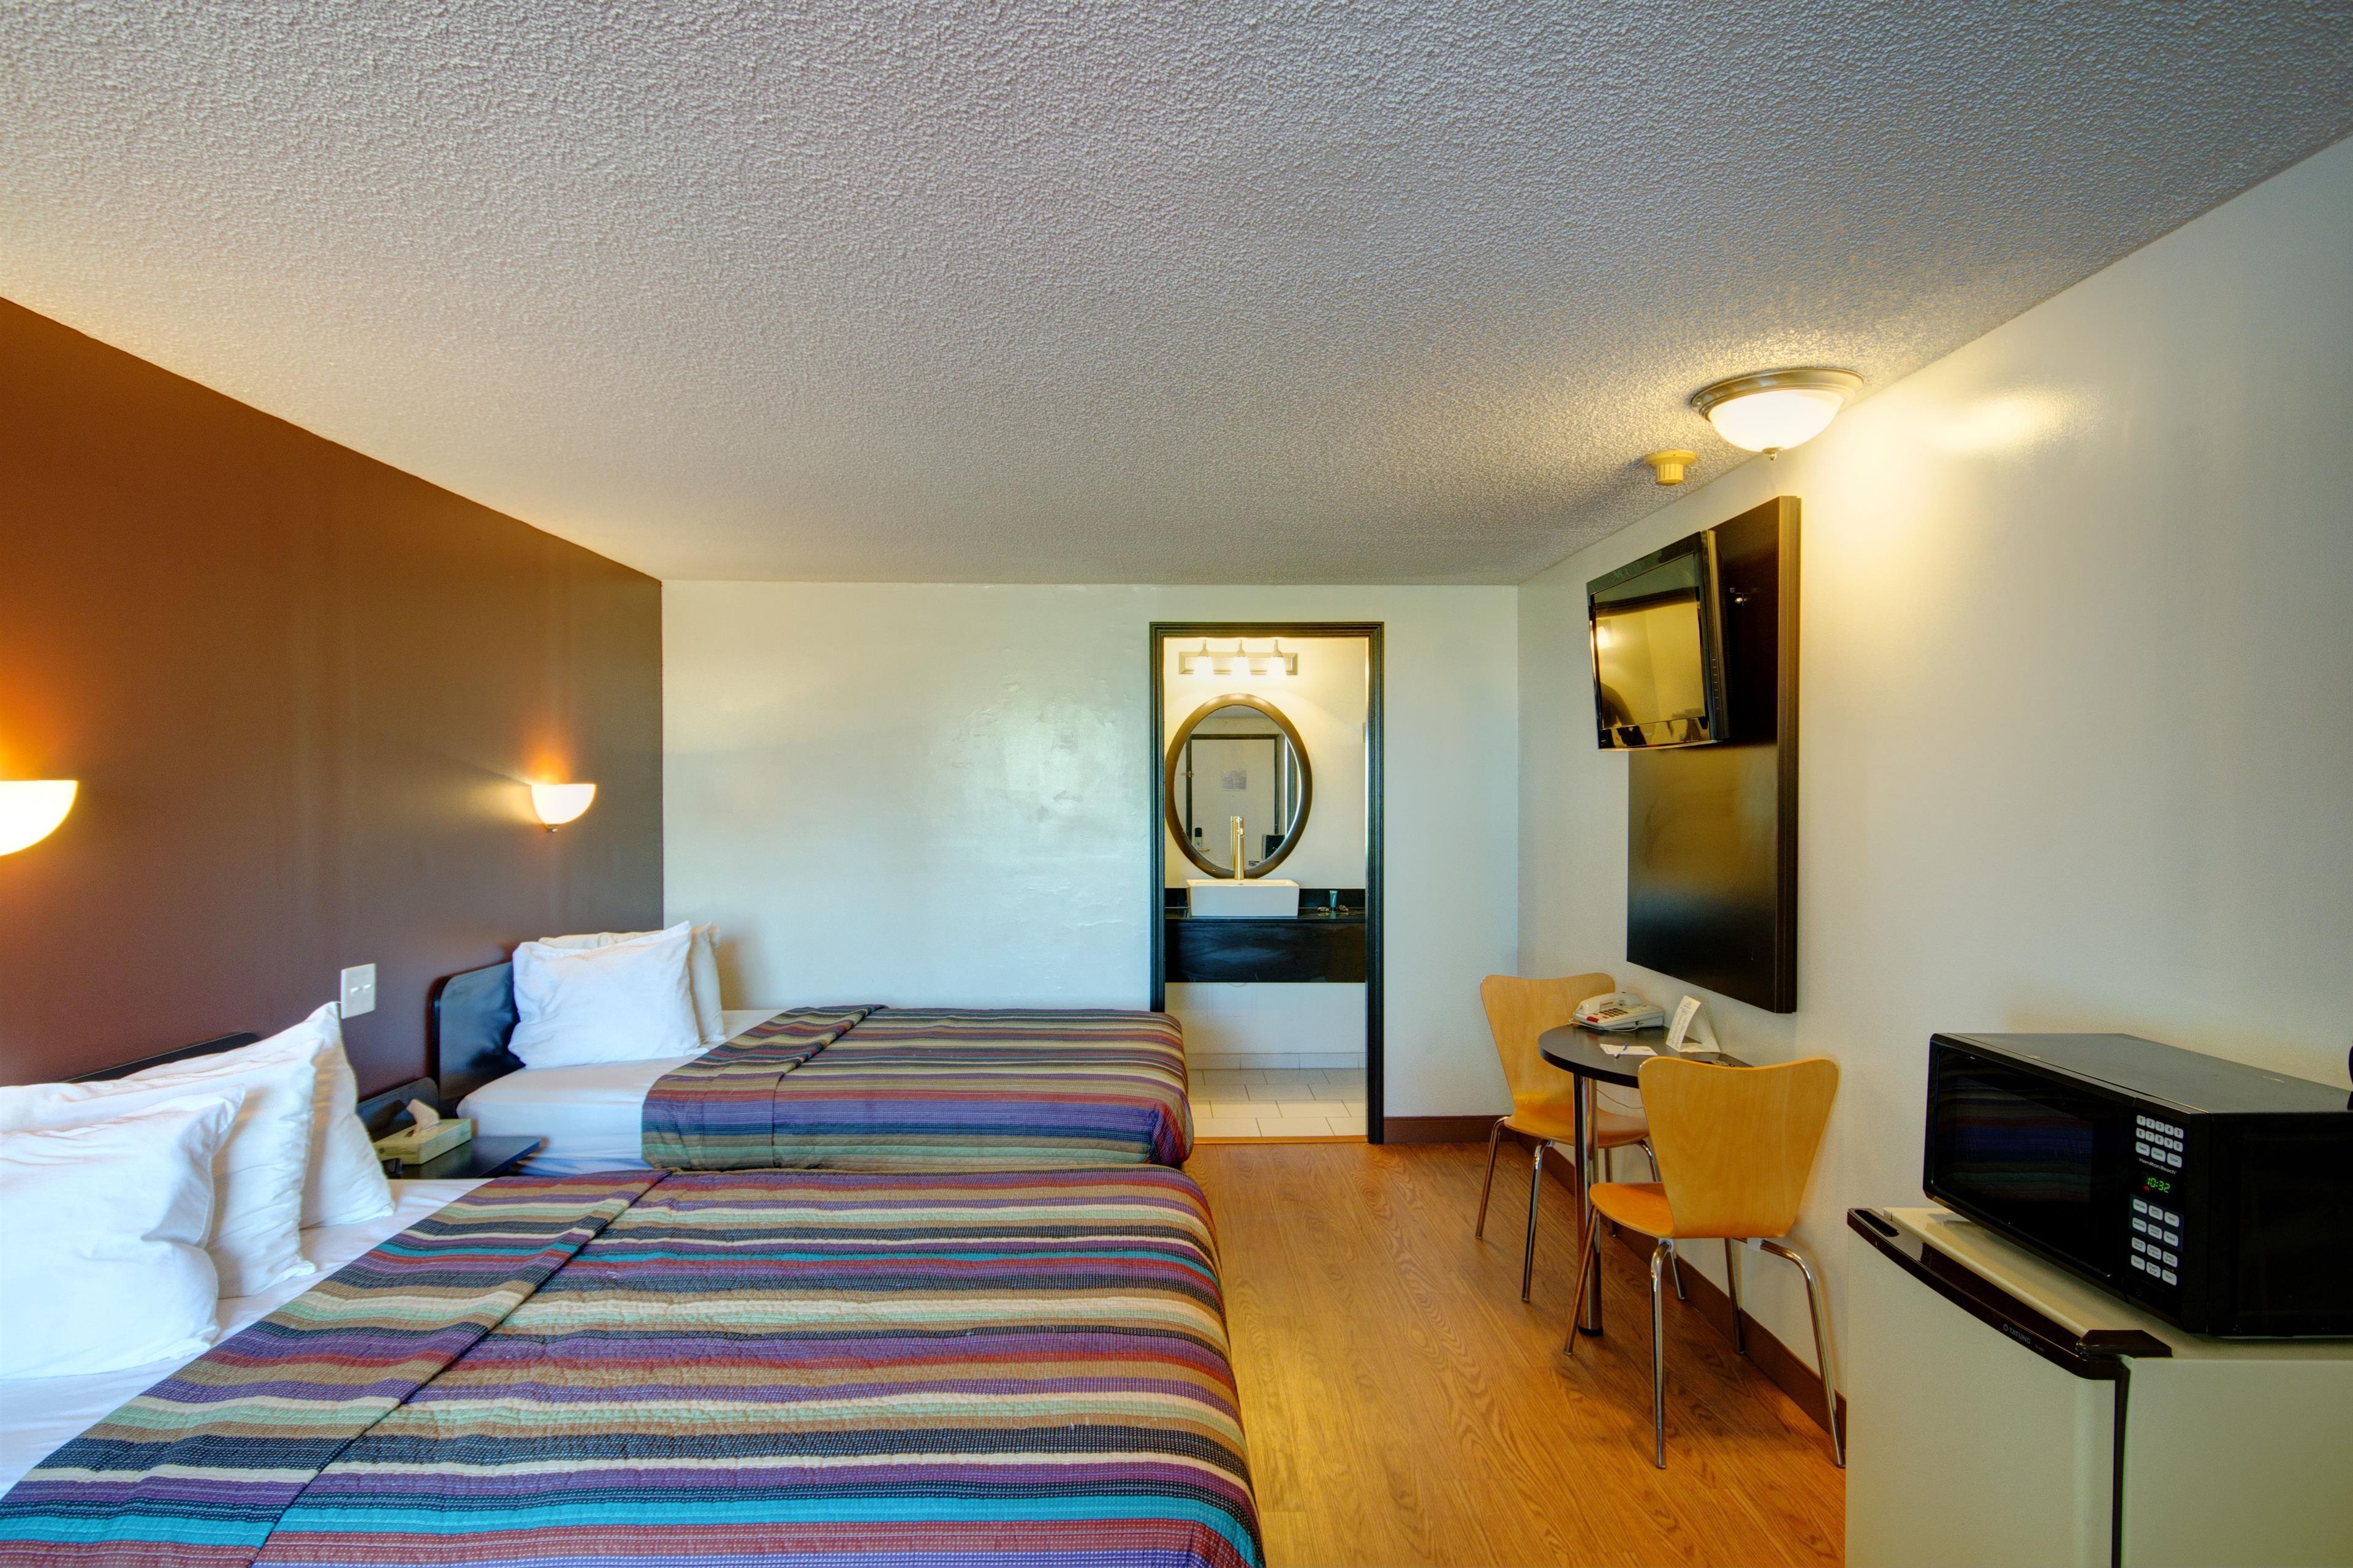 Americas Best Value Inn - Heath/Newark image 14